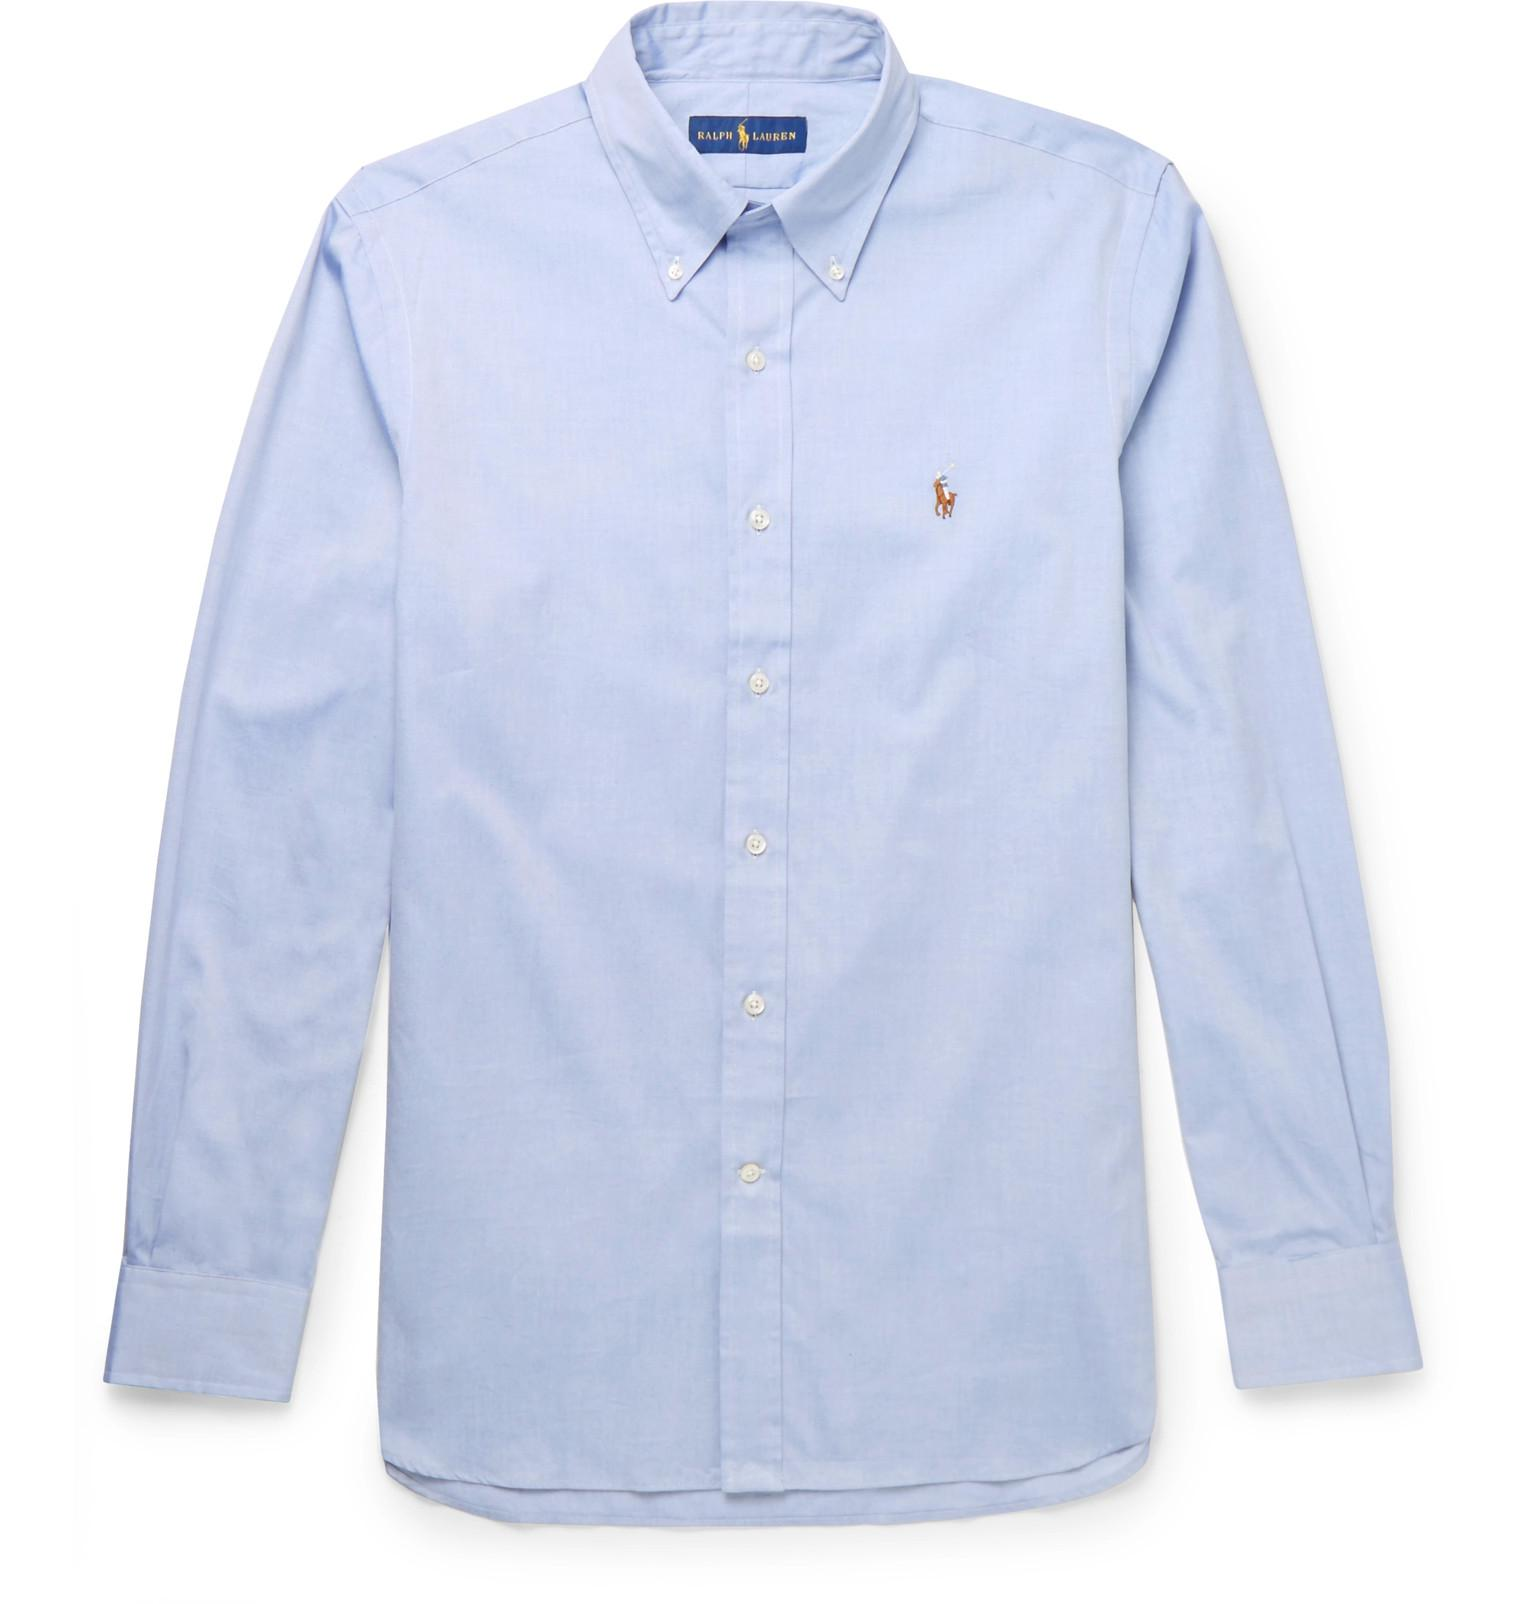 5f3df0c0b1de09 Lyst - Polo Ralph Lauren Button-down Collar Cotton Oxford Shirt in ...